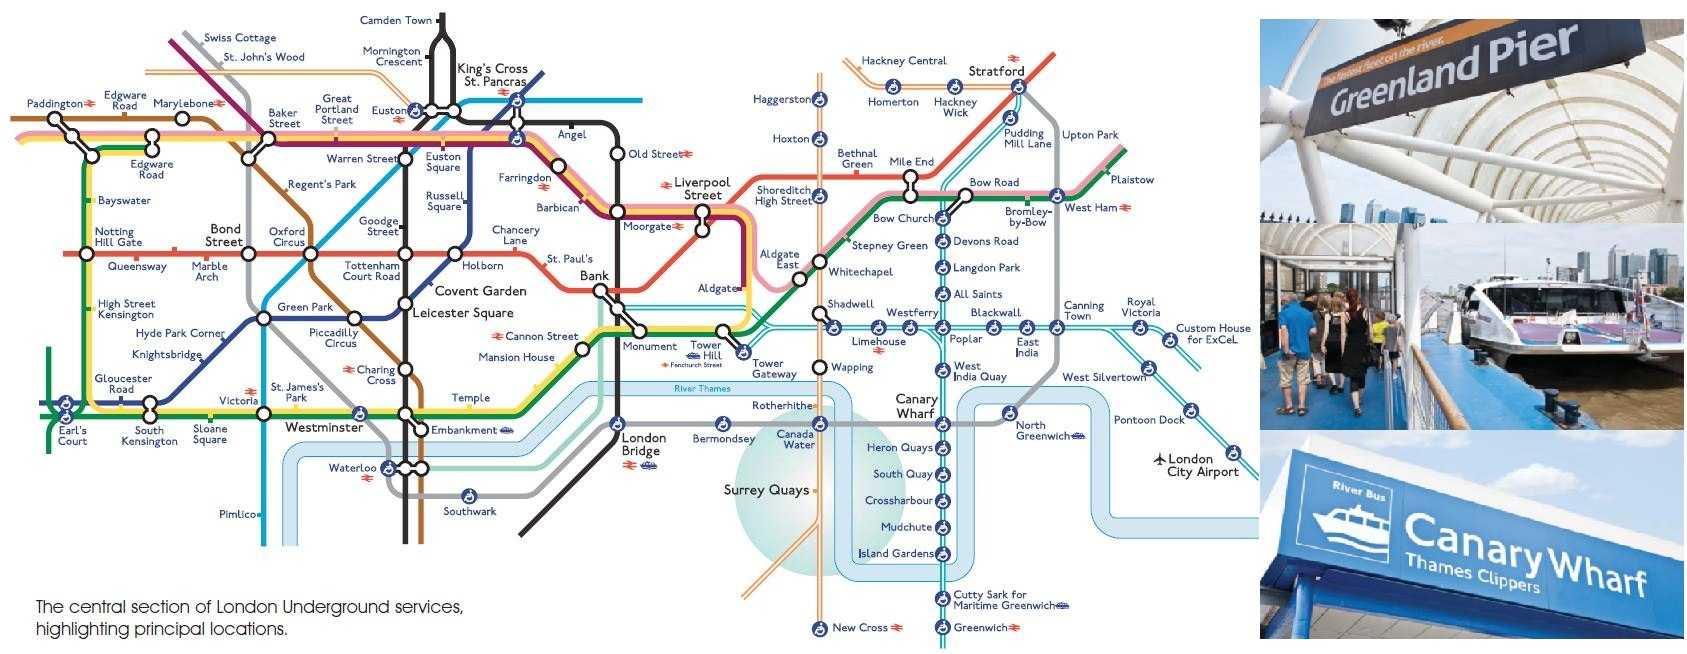 marine-wharf-east-london-rail-connectivity